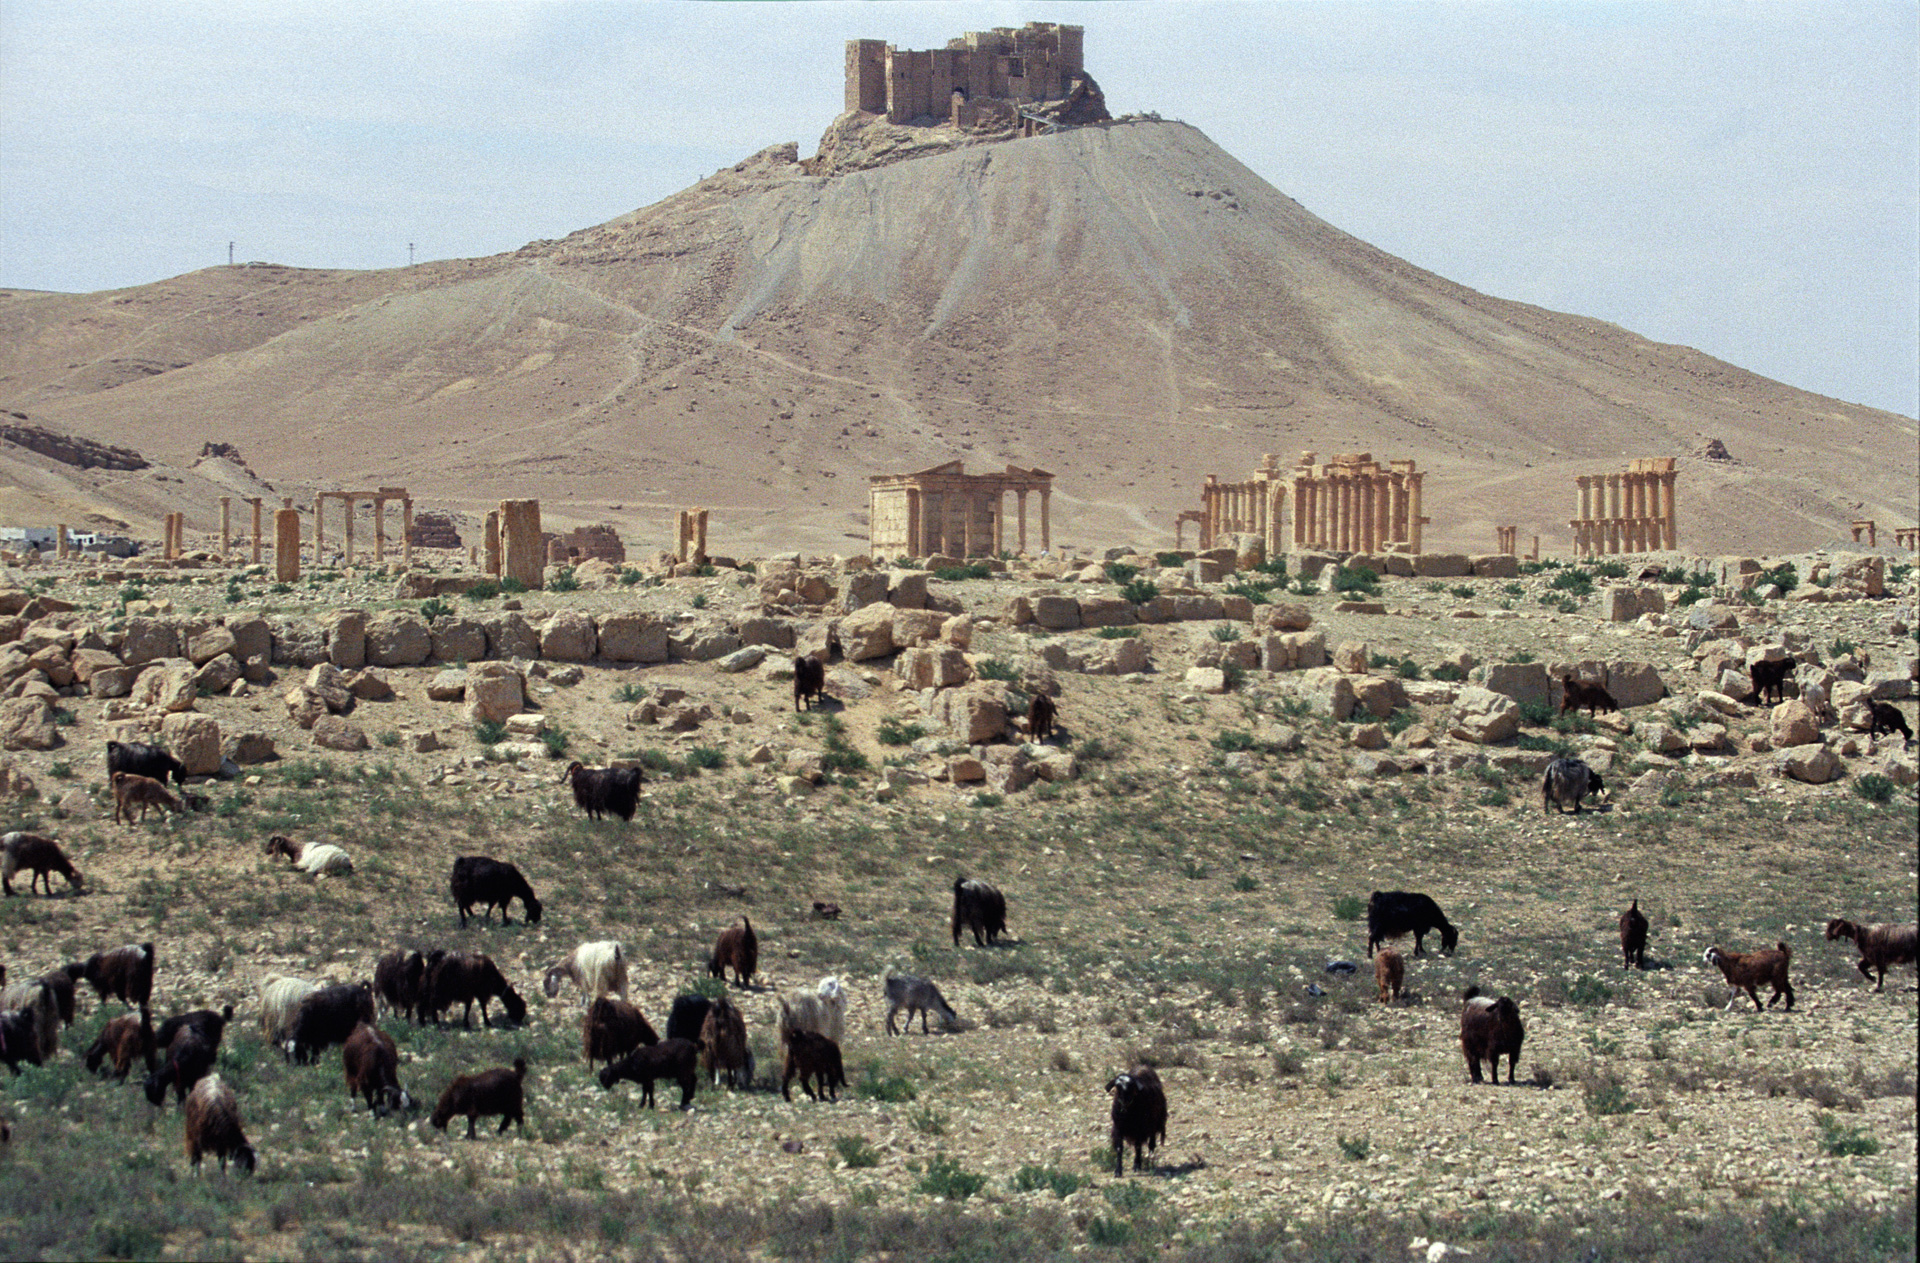 Depiction of Qalat